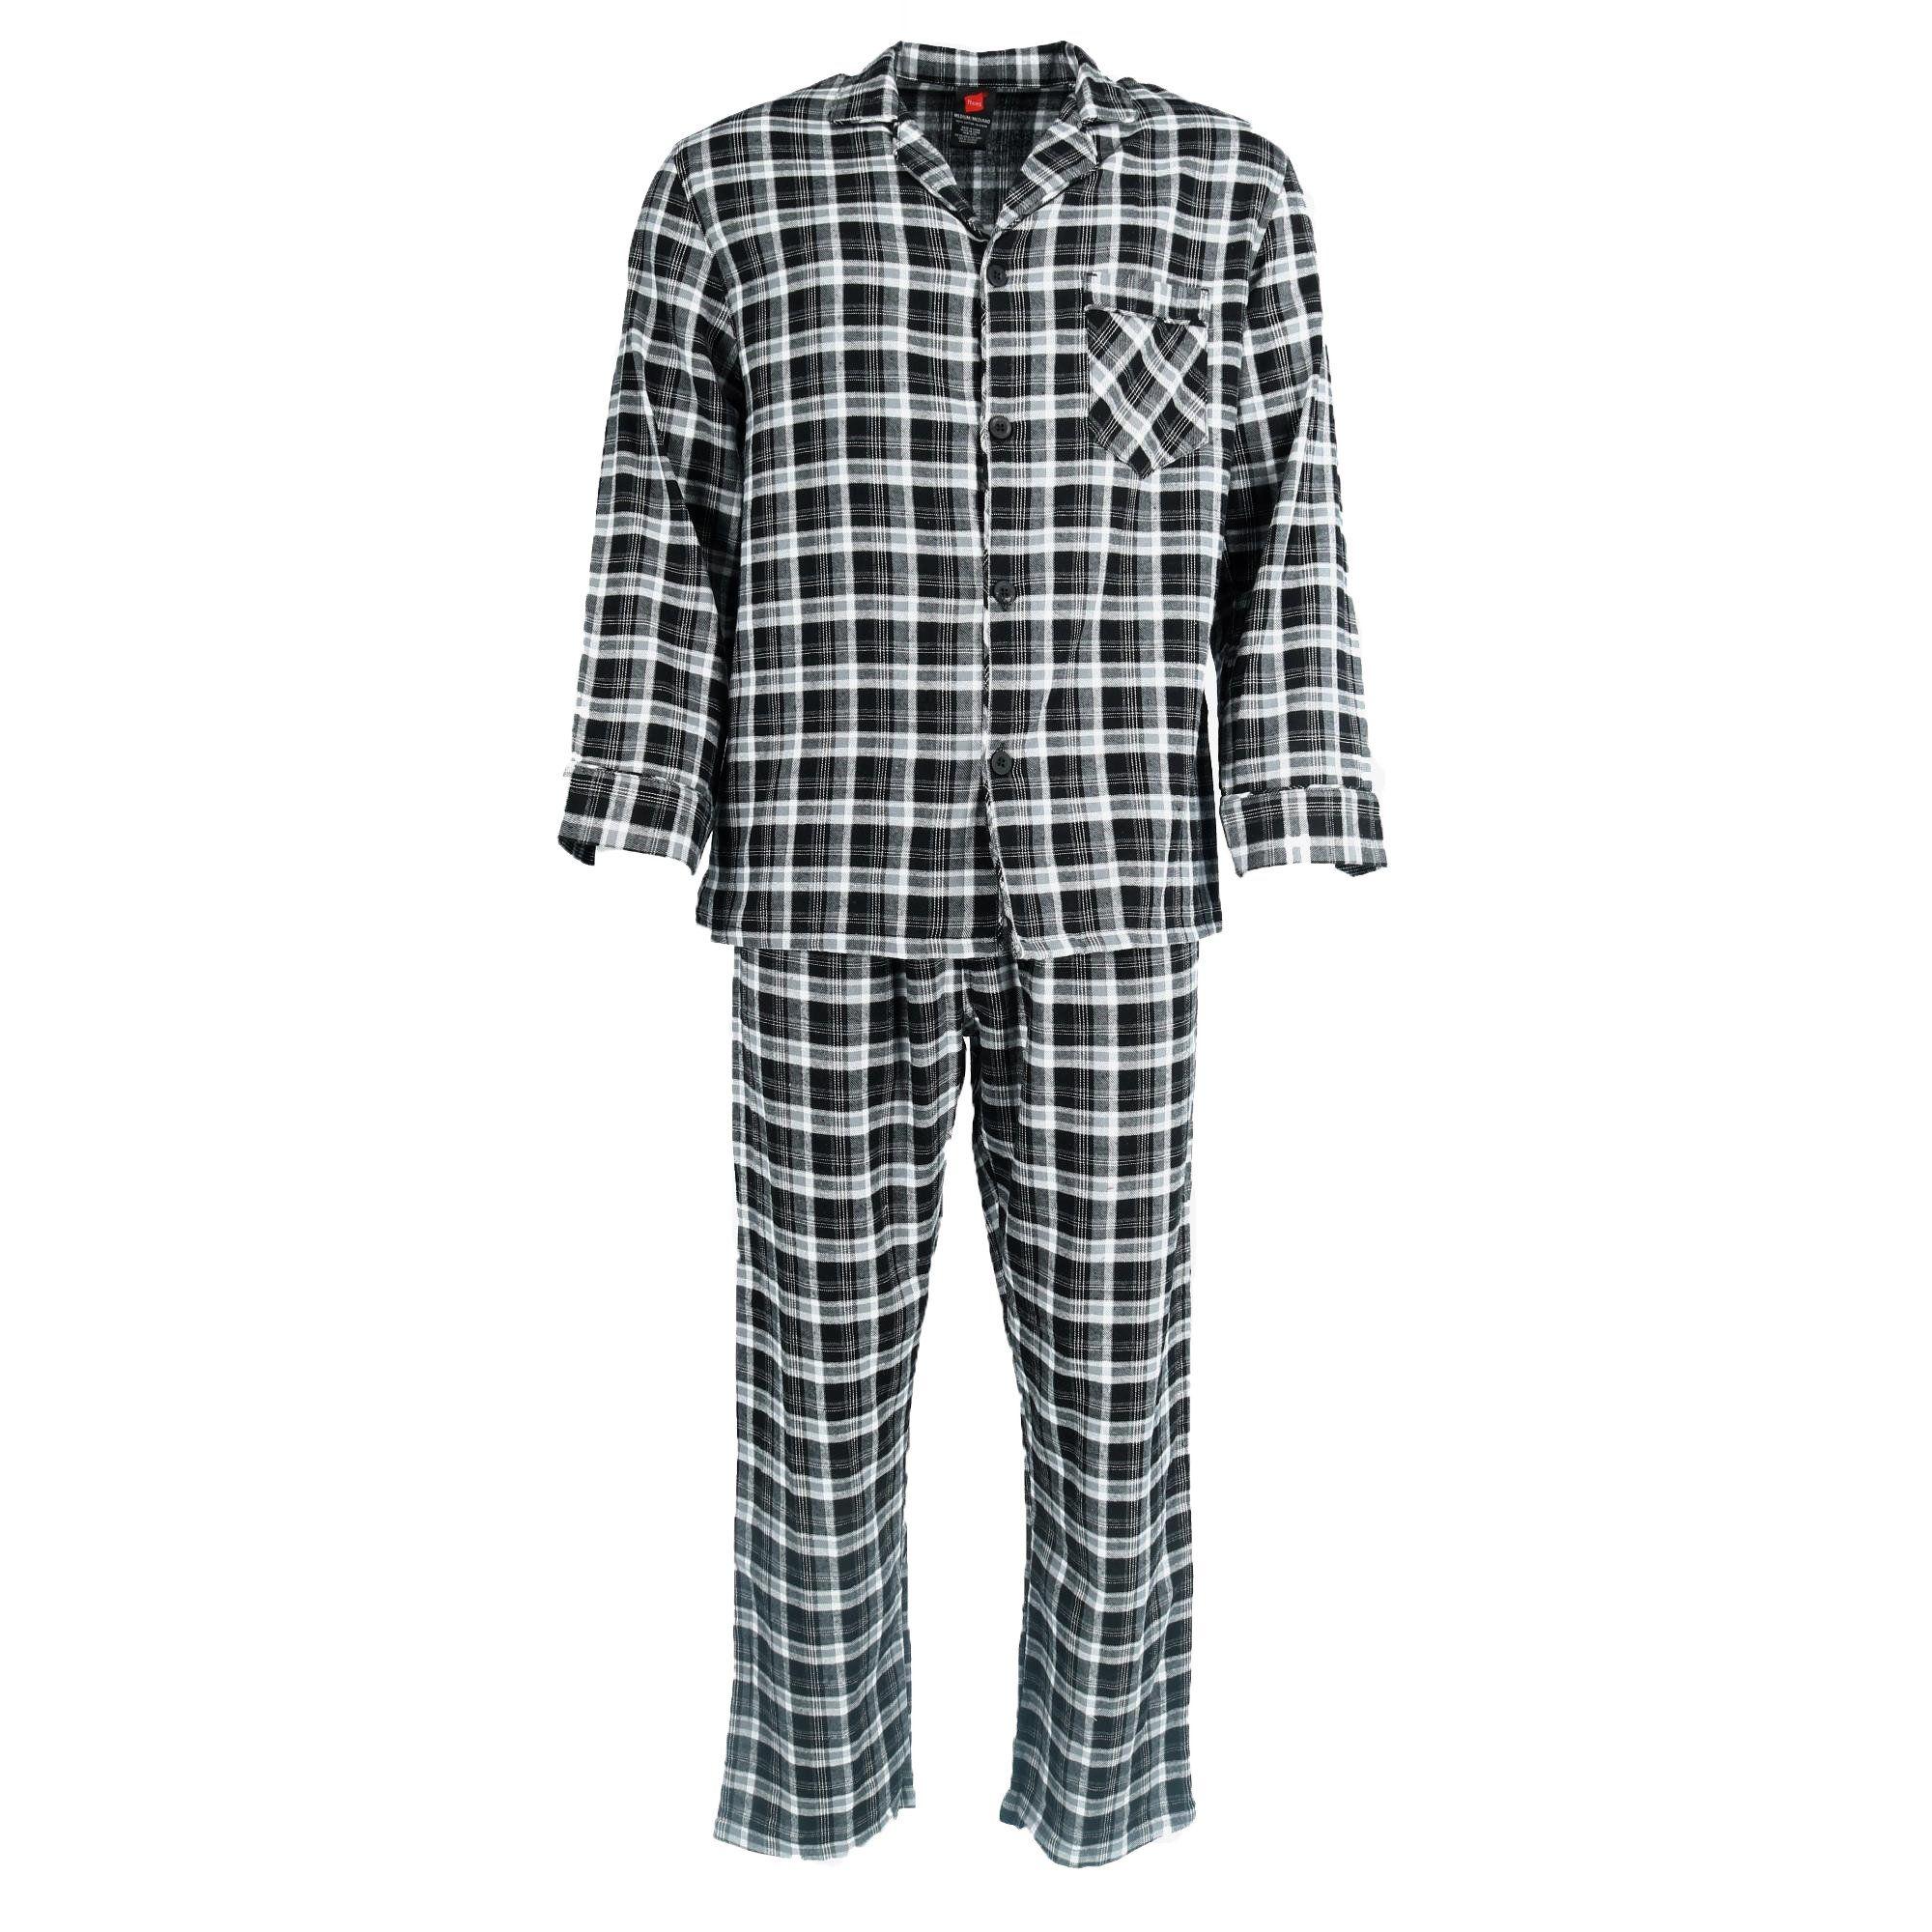 Hanes Mens 100/% Cotton Flannel Plaid Pajama Top and Pant Set